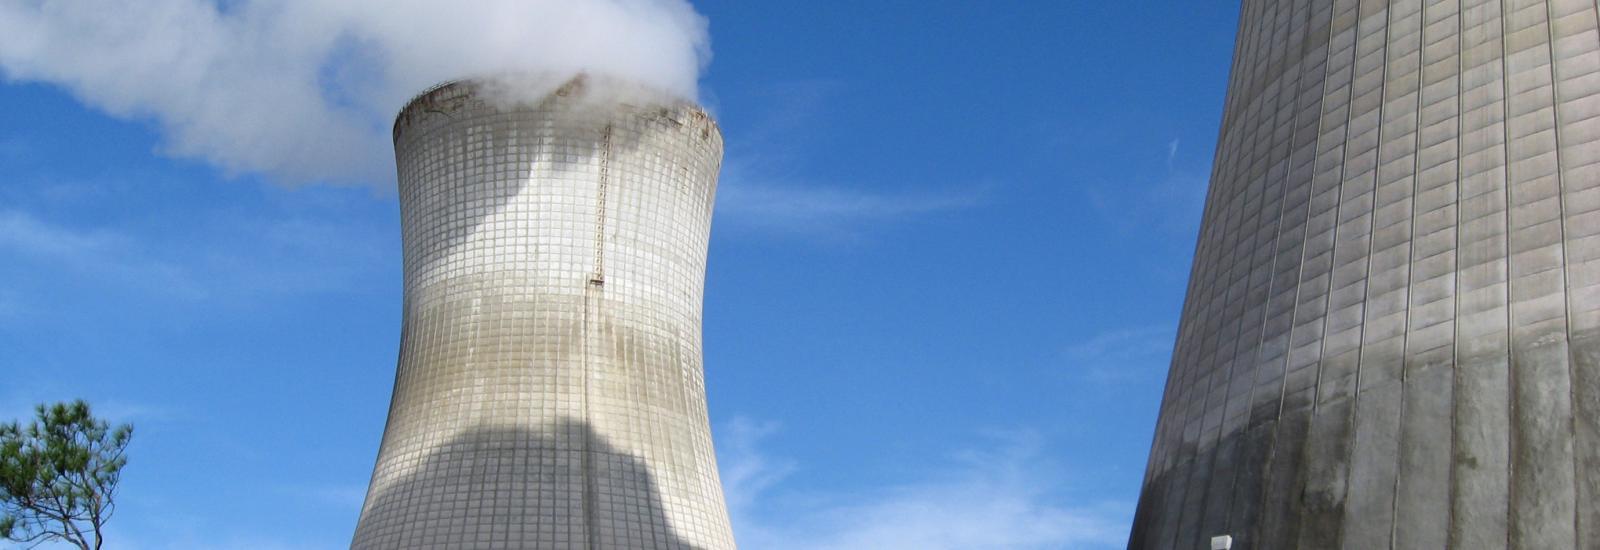 St Johns River Power Plant